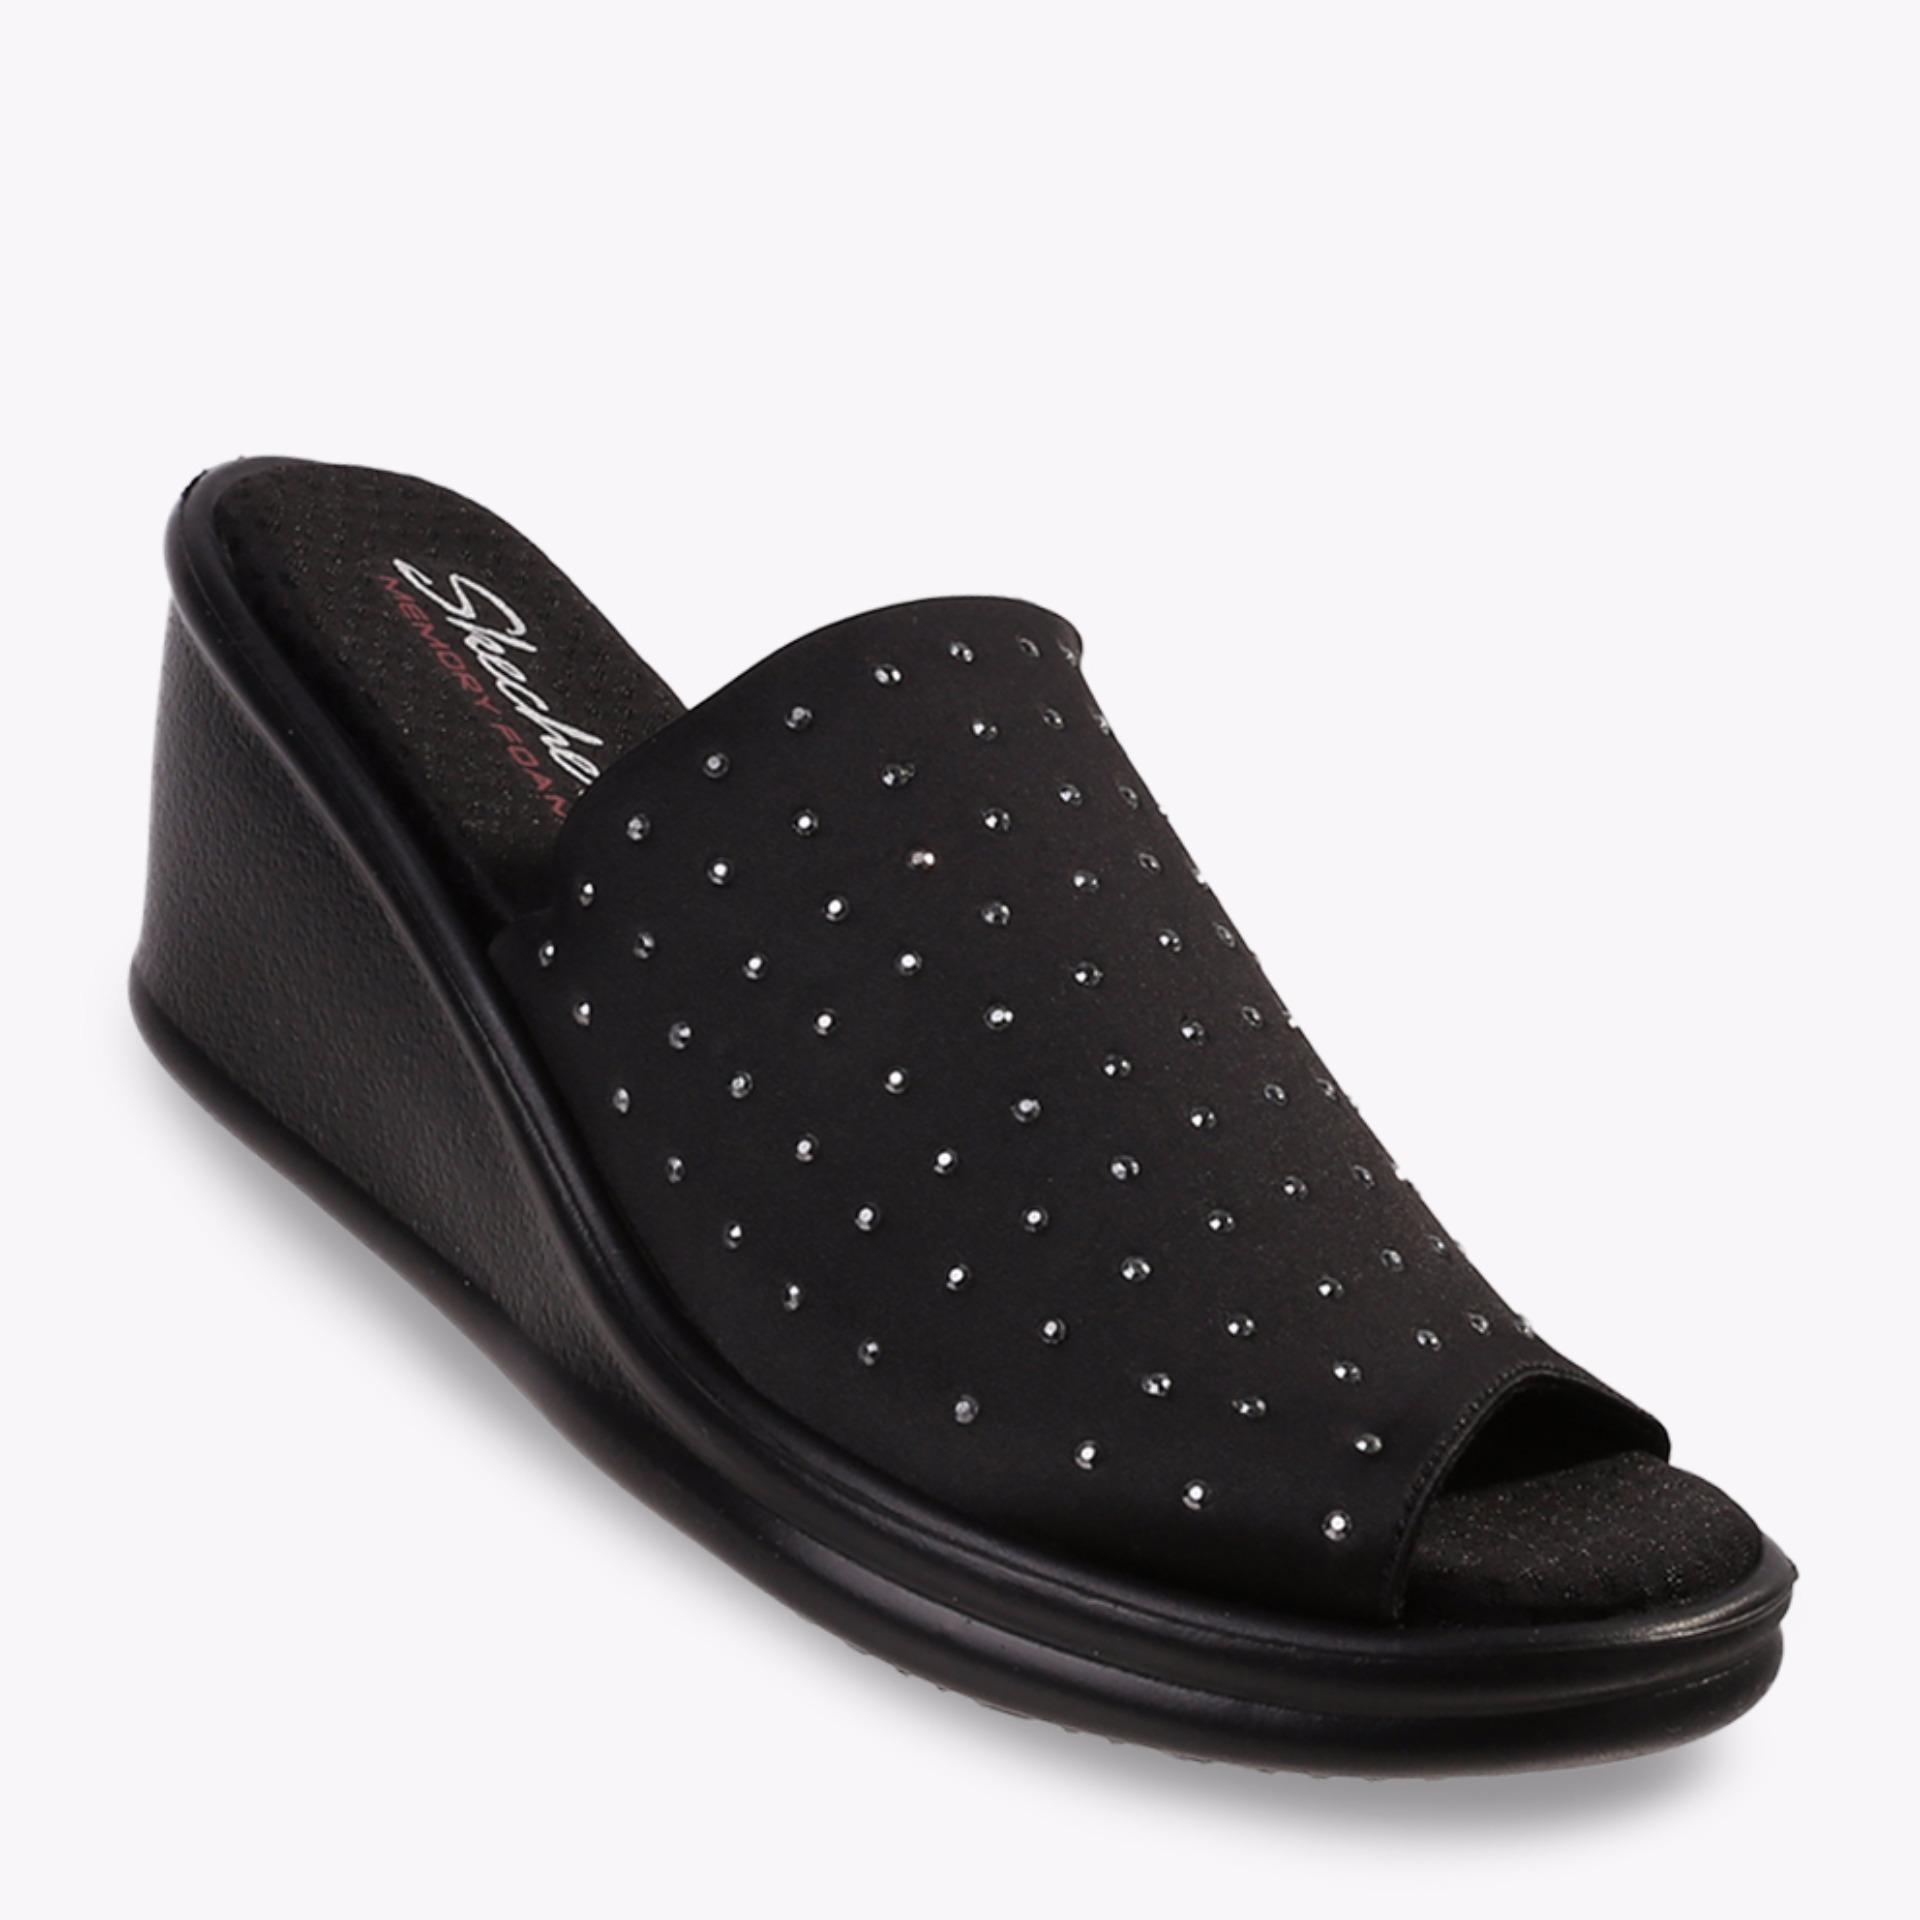 Skechers Rumblers Women S Sandals Hitam Murah